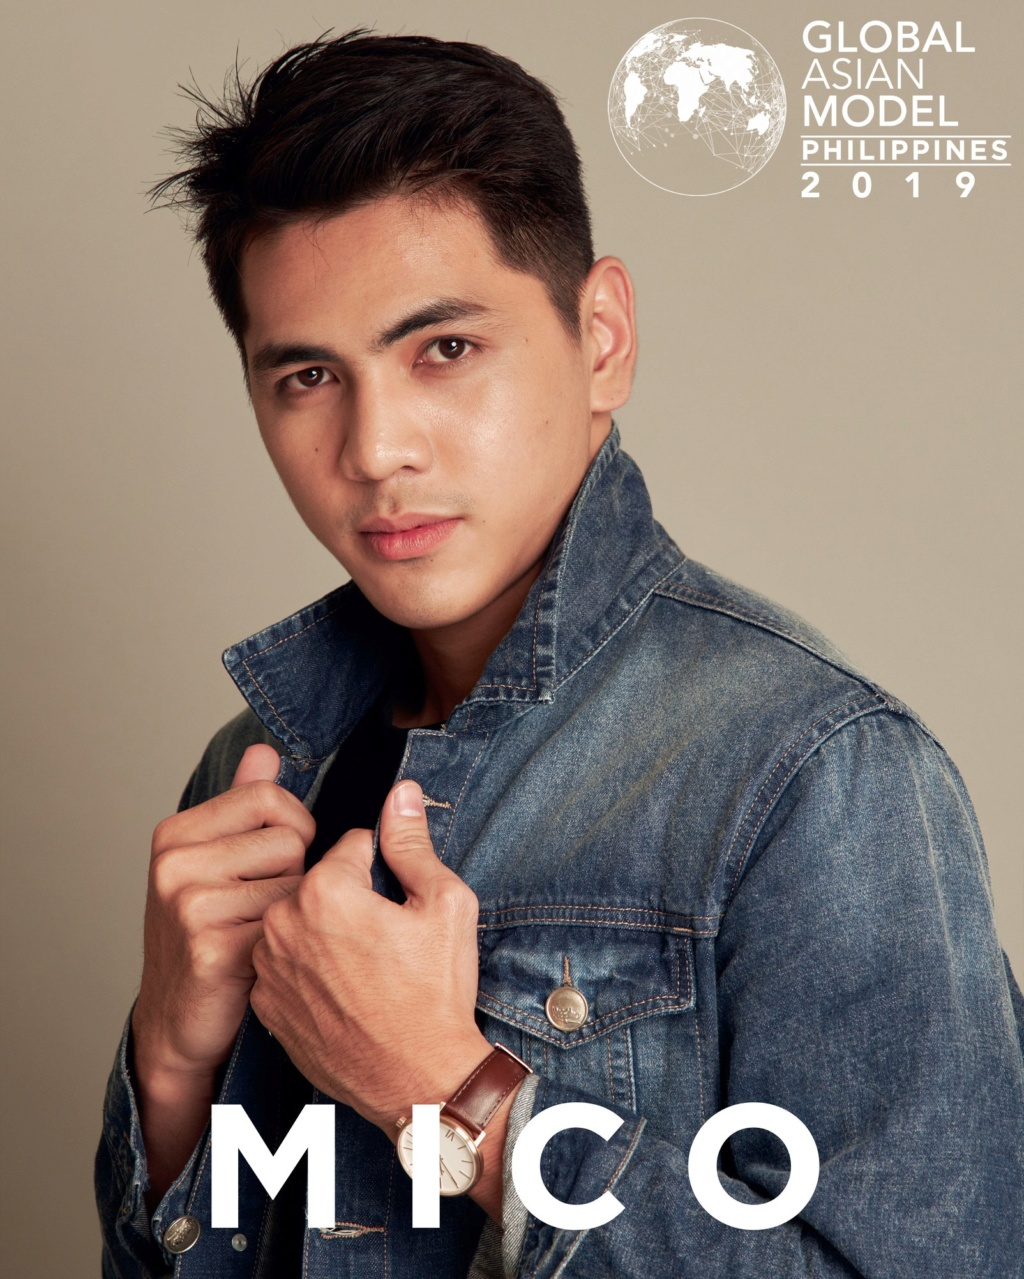 Male Global Asian Model Philippines 2019 Winners Global10